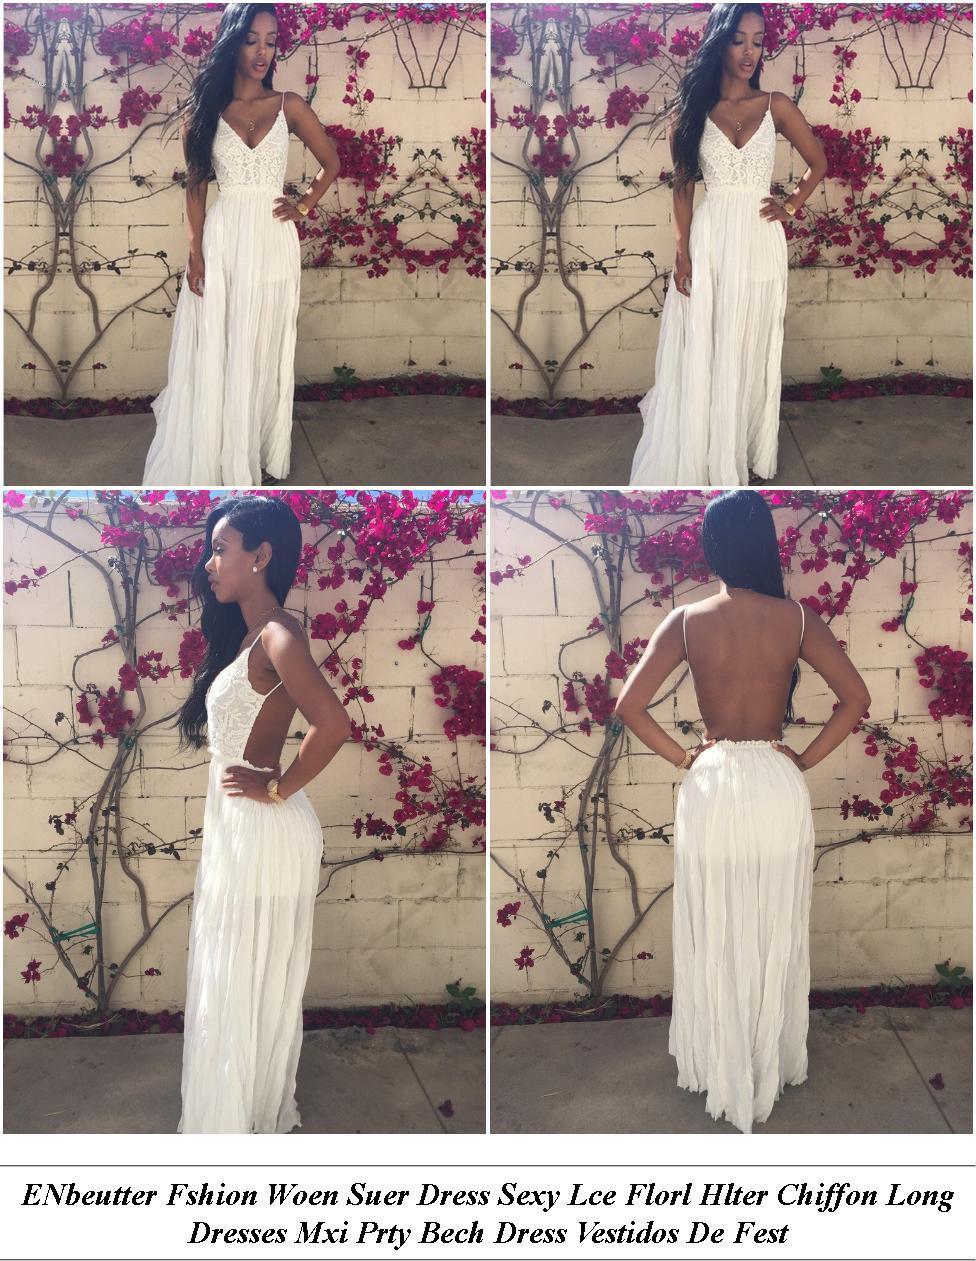 Summer Dresses For Women - On Sale - Black Dress - Cheap Designer Clothes Womens